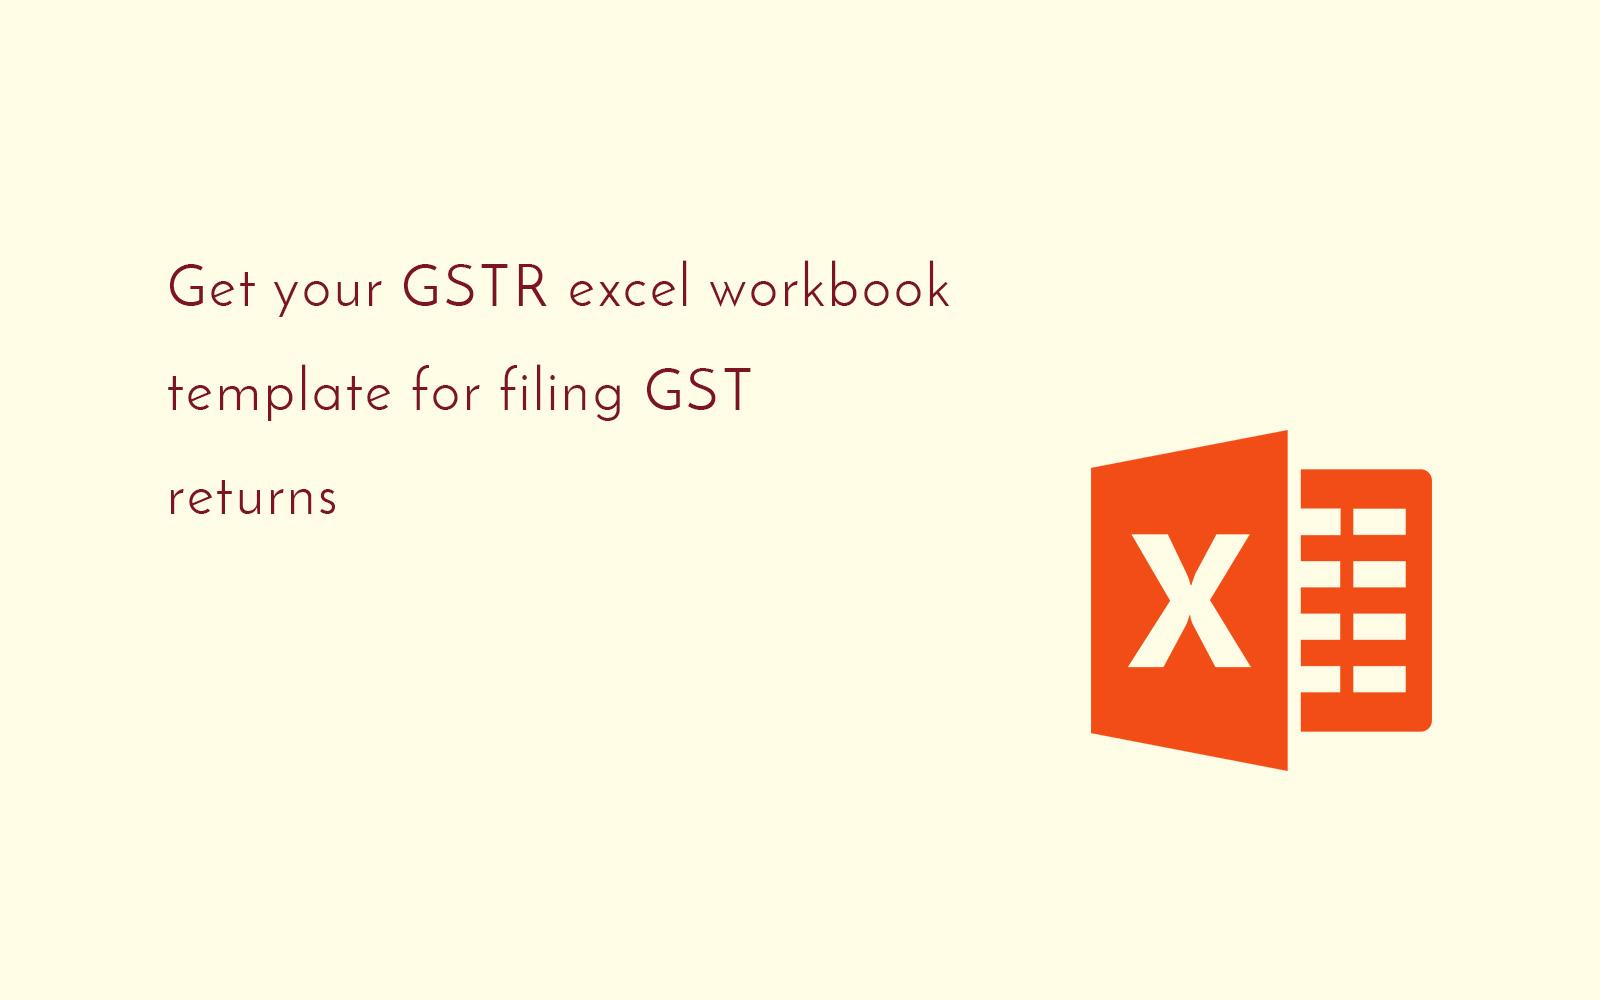 Gstn Released Excel Template For Filing Gst Returns